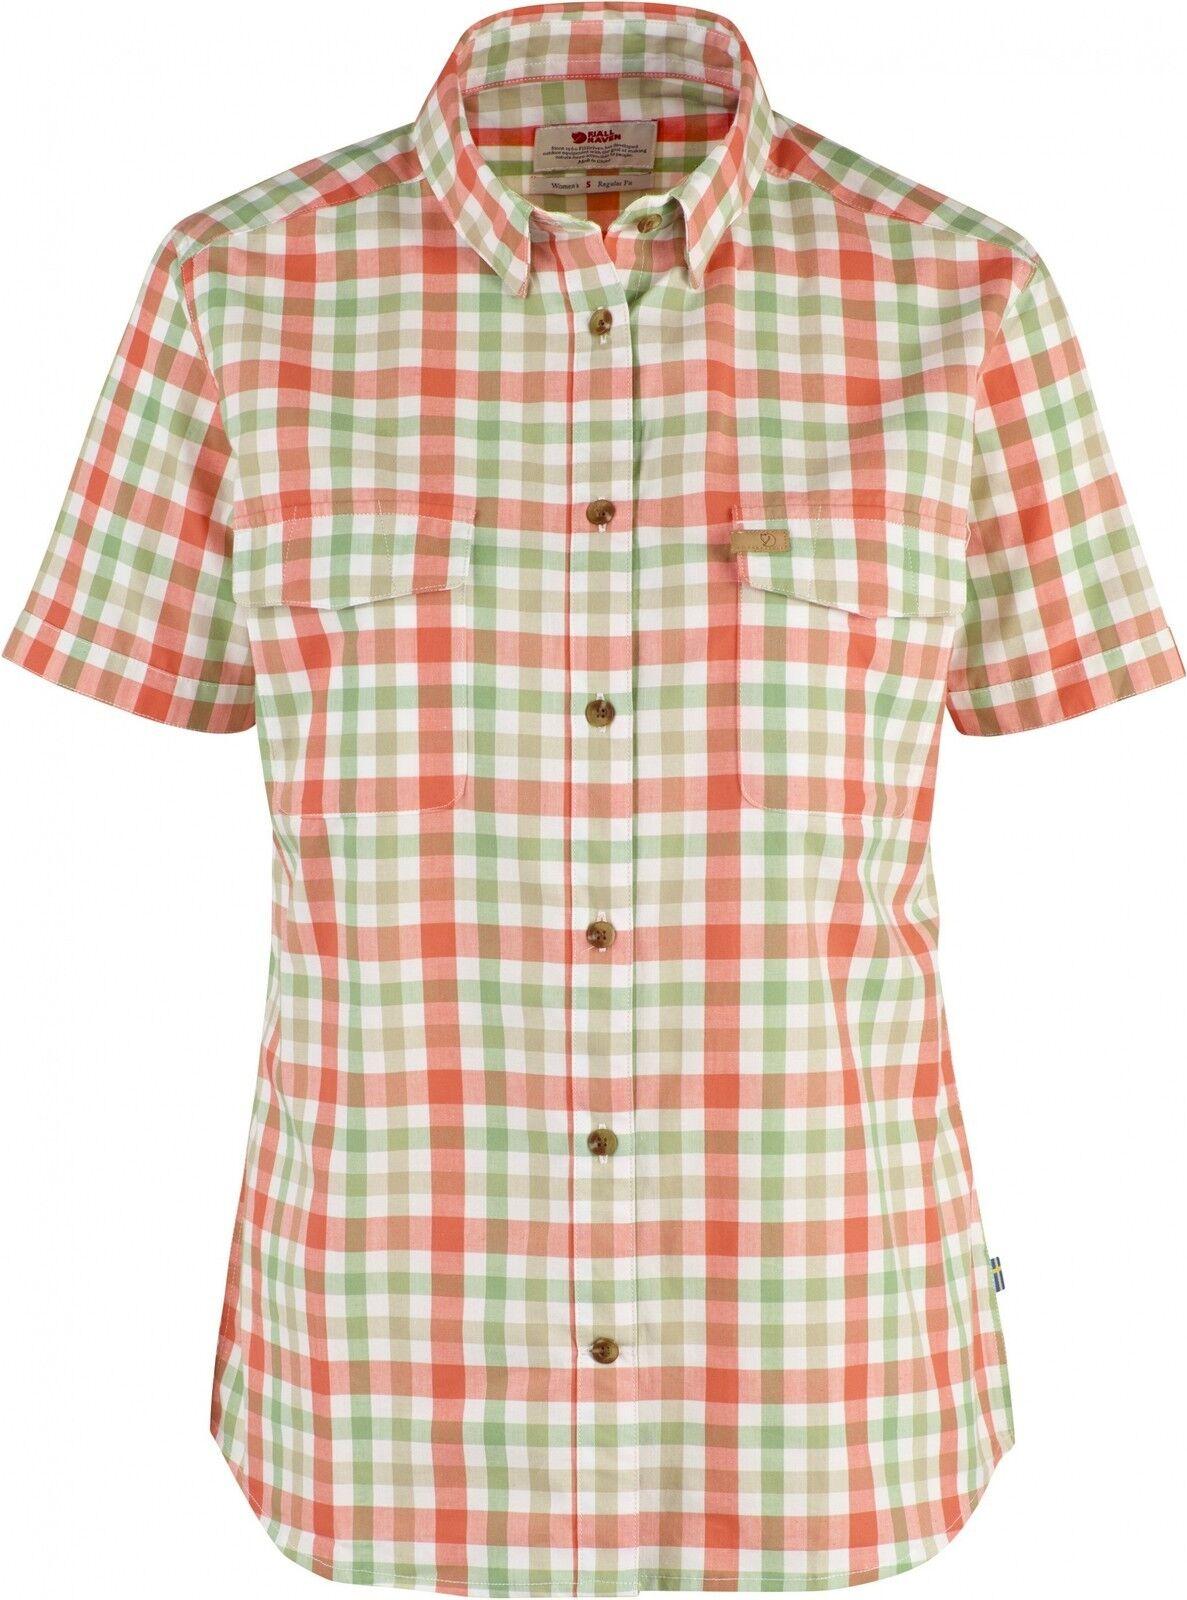 Fjäll  Räven Övik Shirt Women's, Coral, Short-Sleeved Ladies Shirt  free shipping worldwide